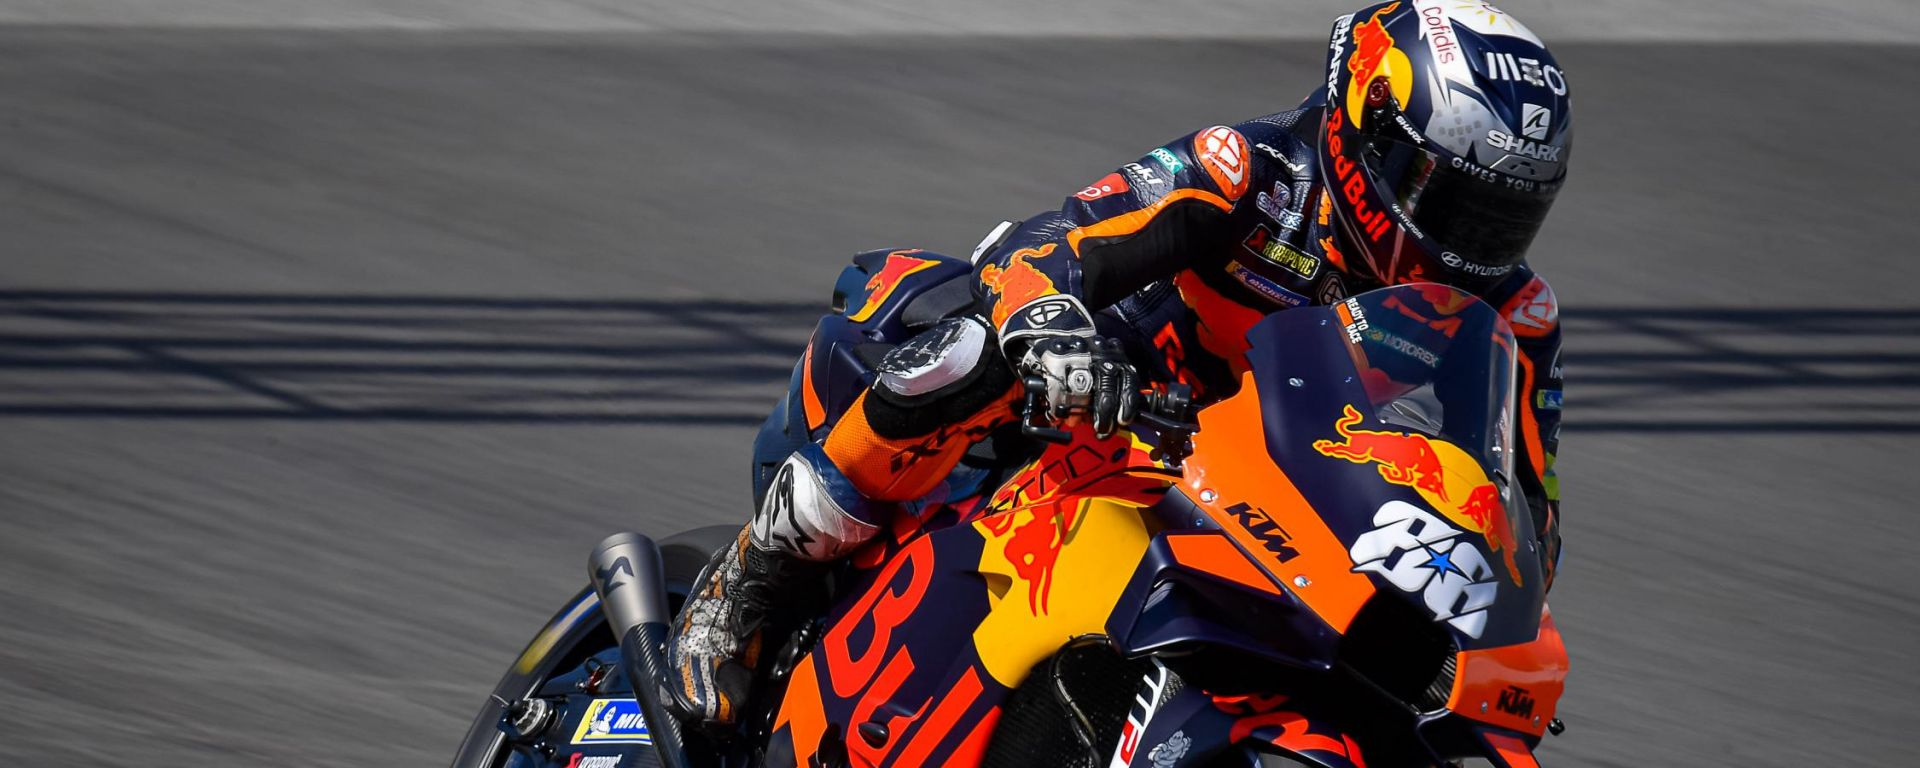 MotoGP Germania 2021, Sachsenring: Miguel Oliveira (KTM)